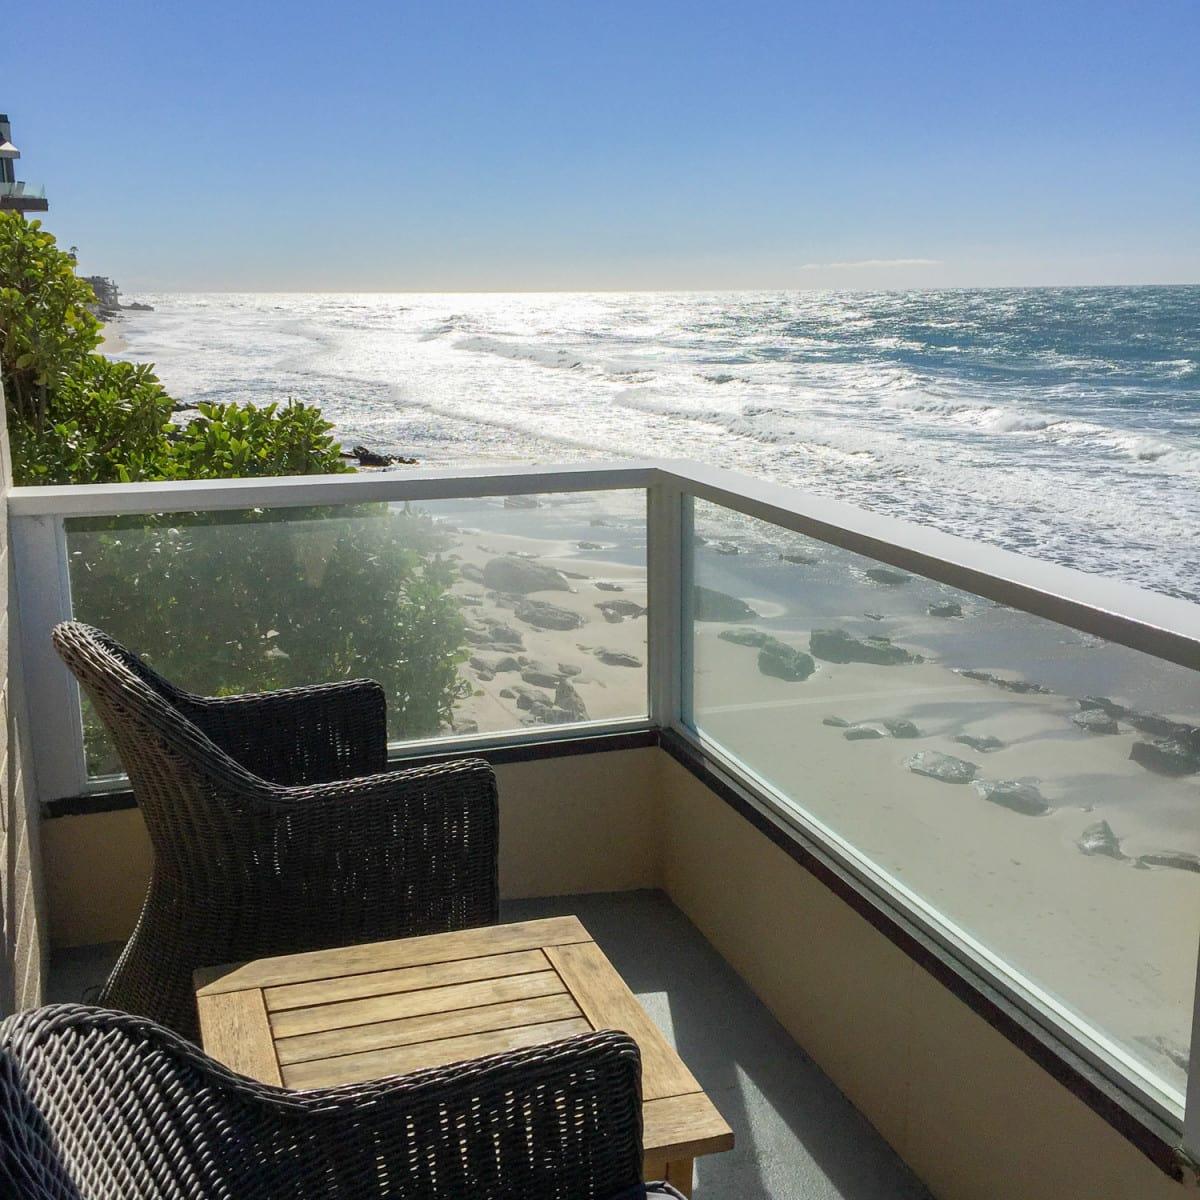 Pacific Edge Hotel in Laguna Beach, California